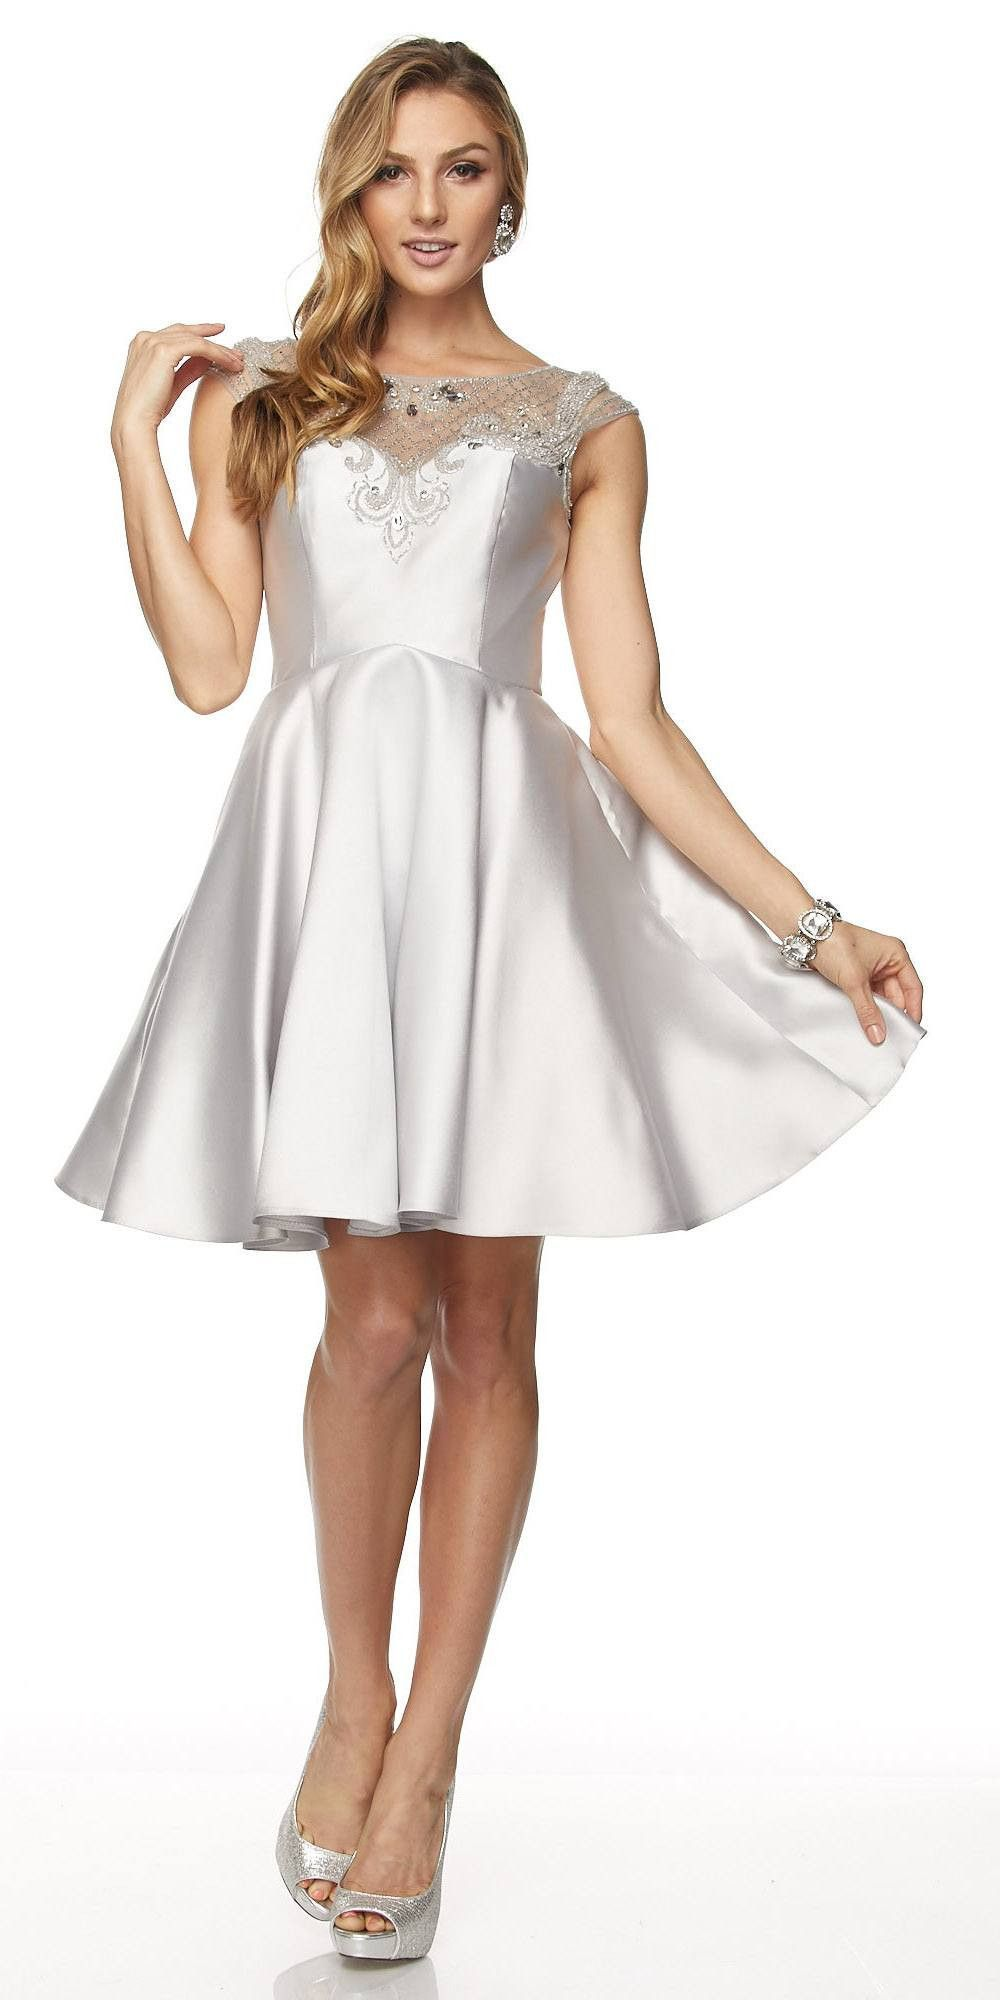 Juliet blush cap sleeves illusion beaded neckline short prom